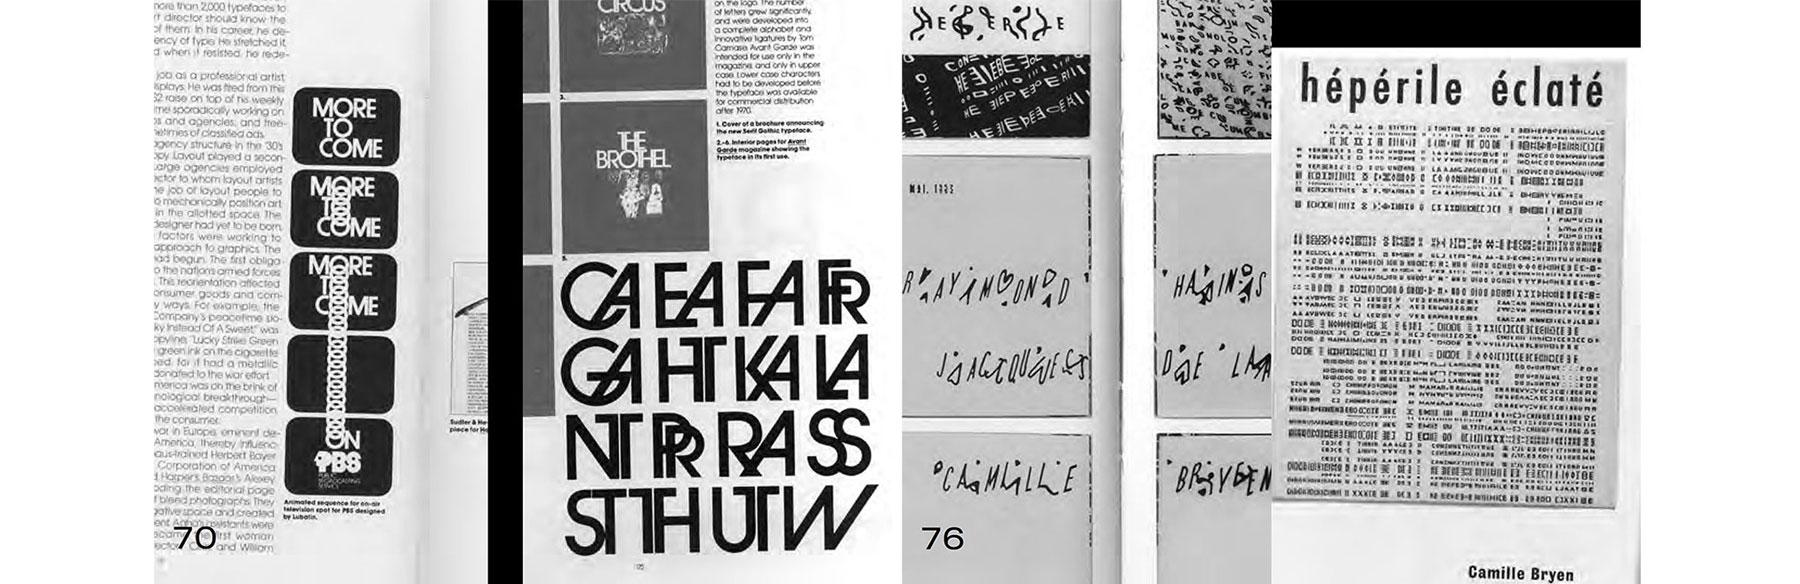 Ligatures-Daniel-Hattenschwiller-Thomas-Petit-cover-index-grafik-memoire-ecal-capture03